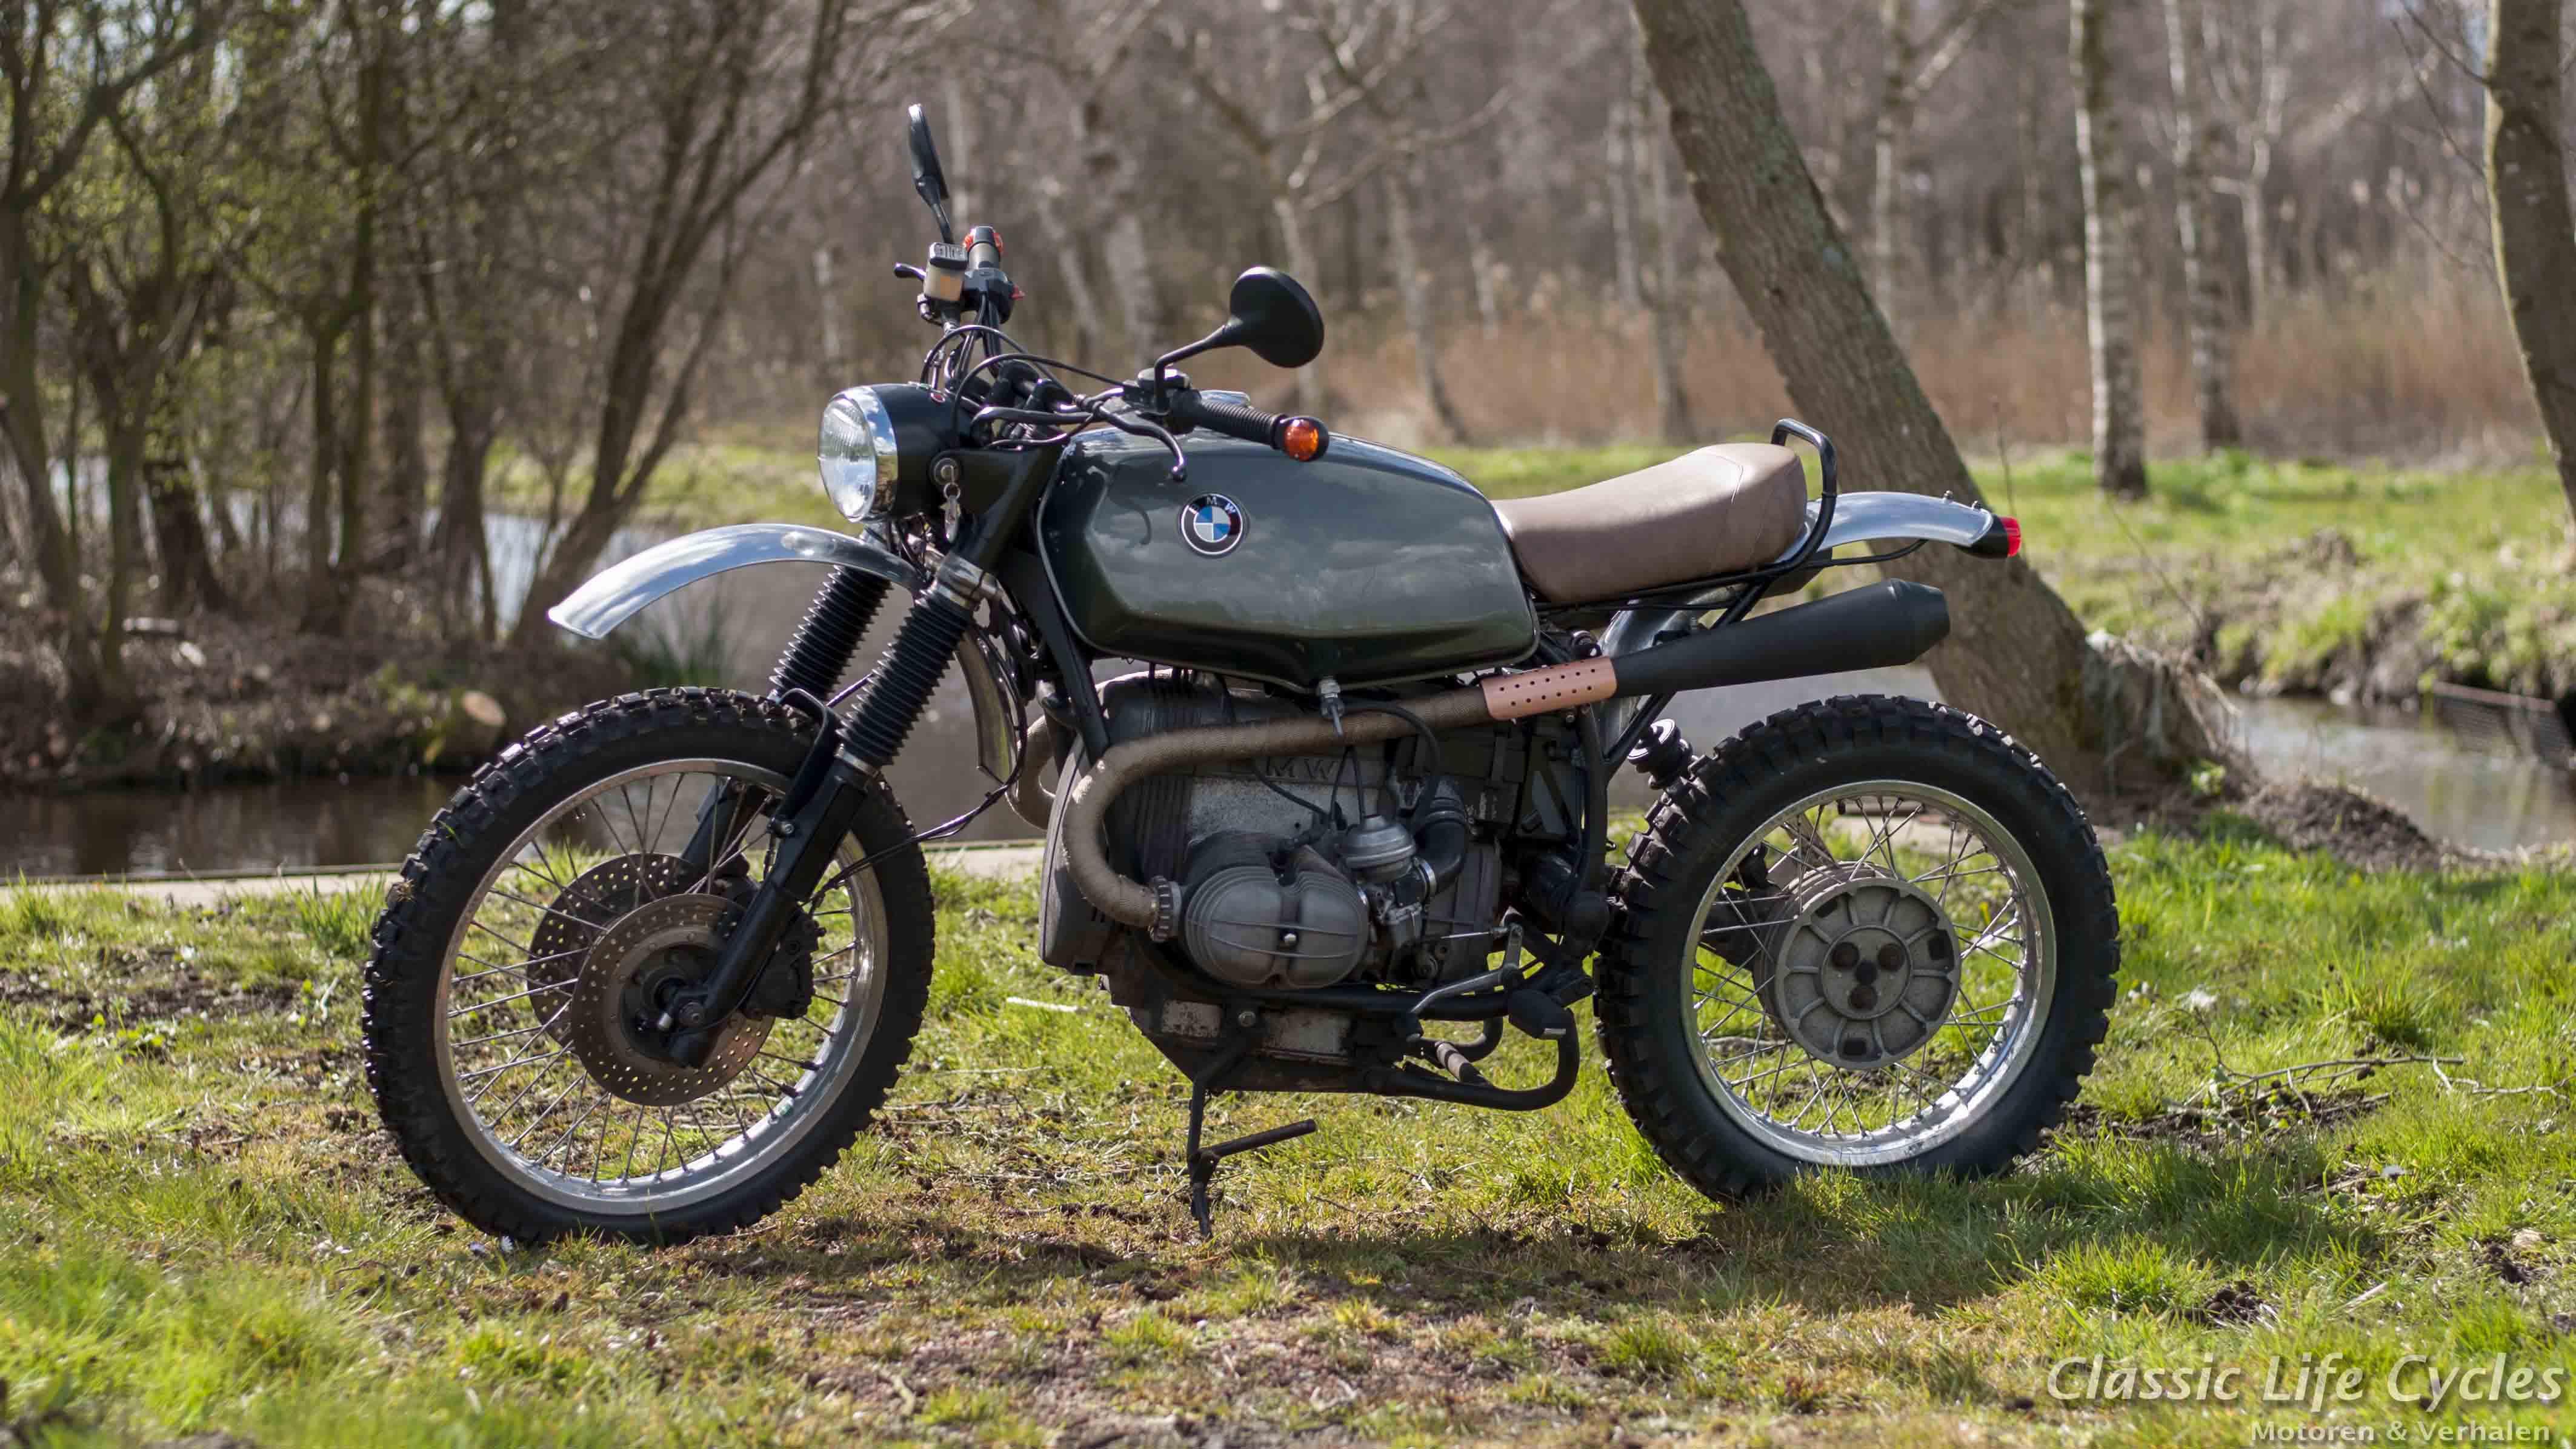 Bien connu Paul's Motorcycles - BMW R80 Scrambler XO11